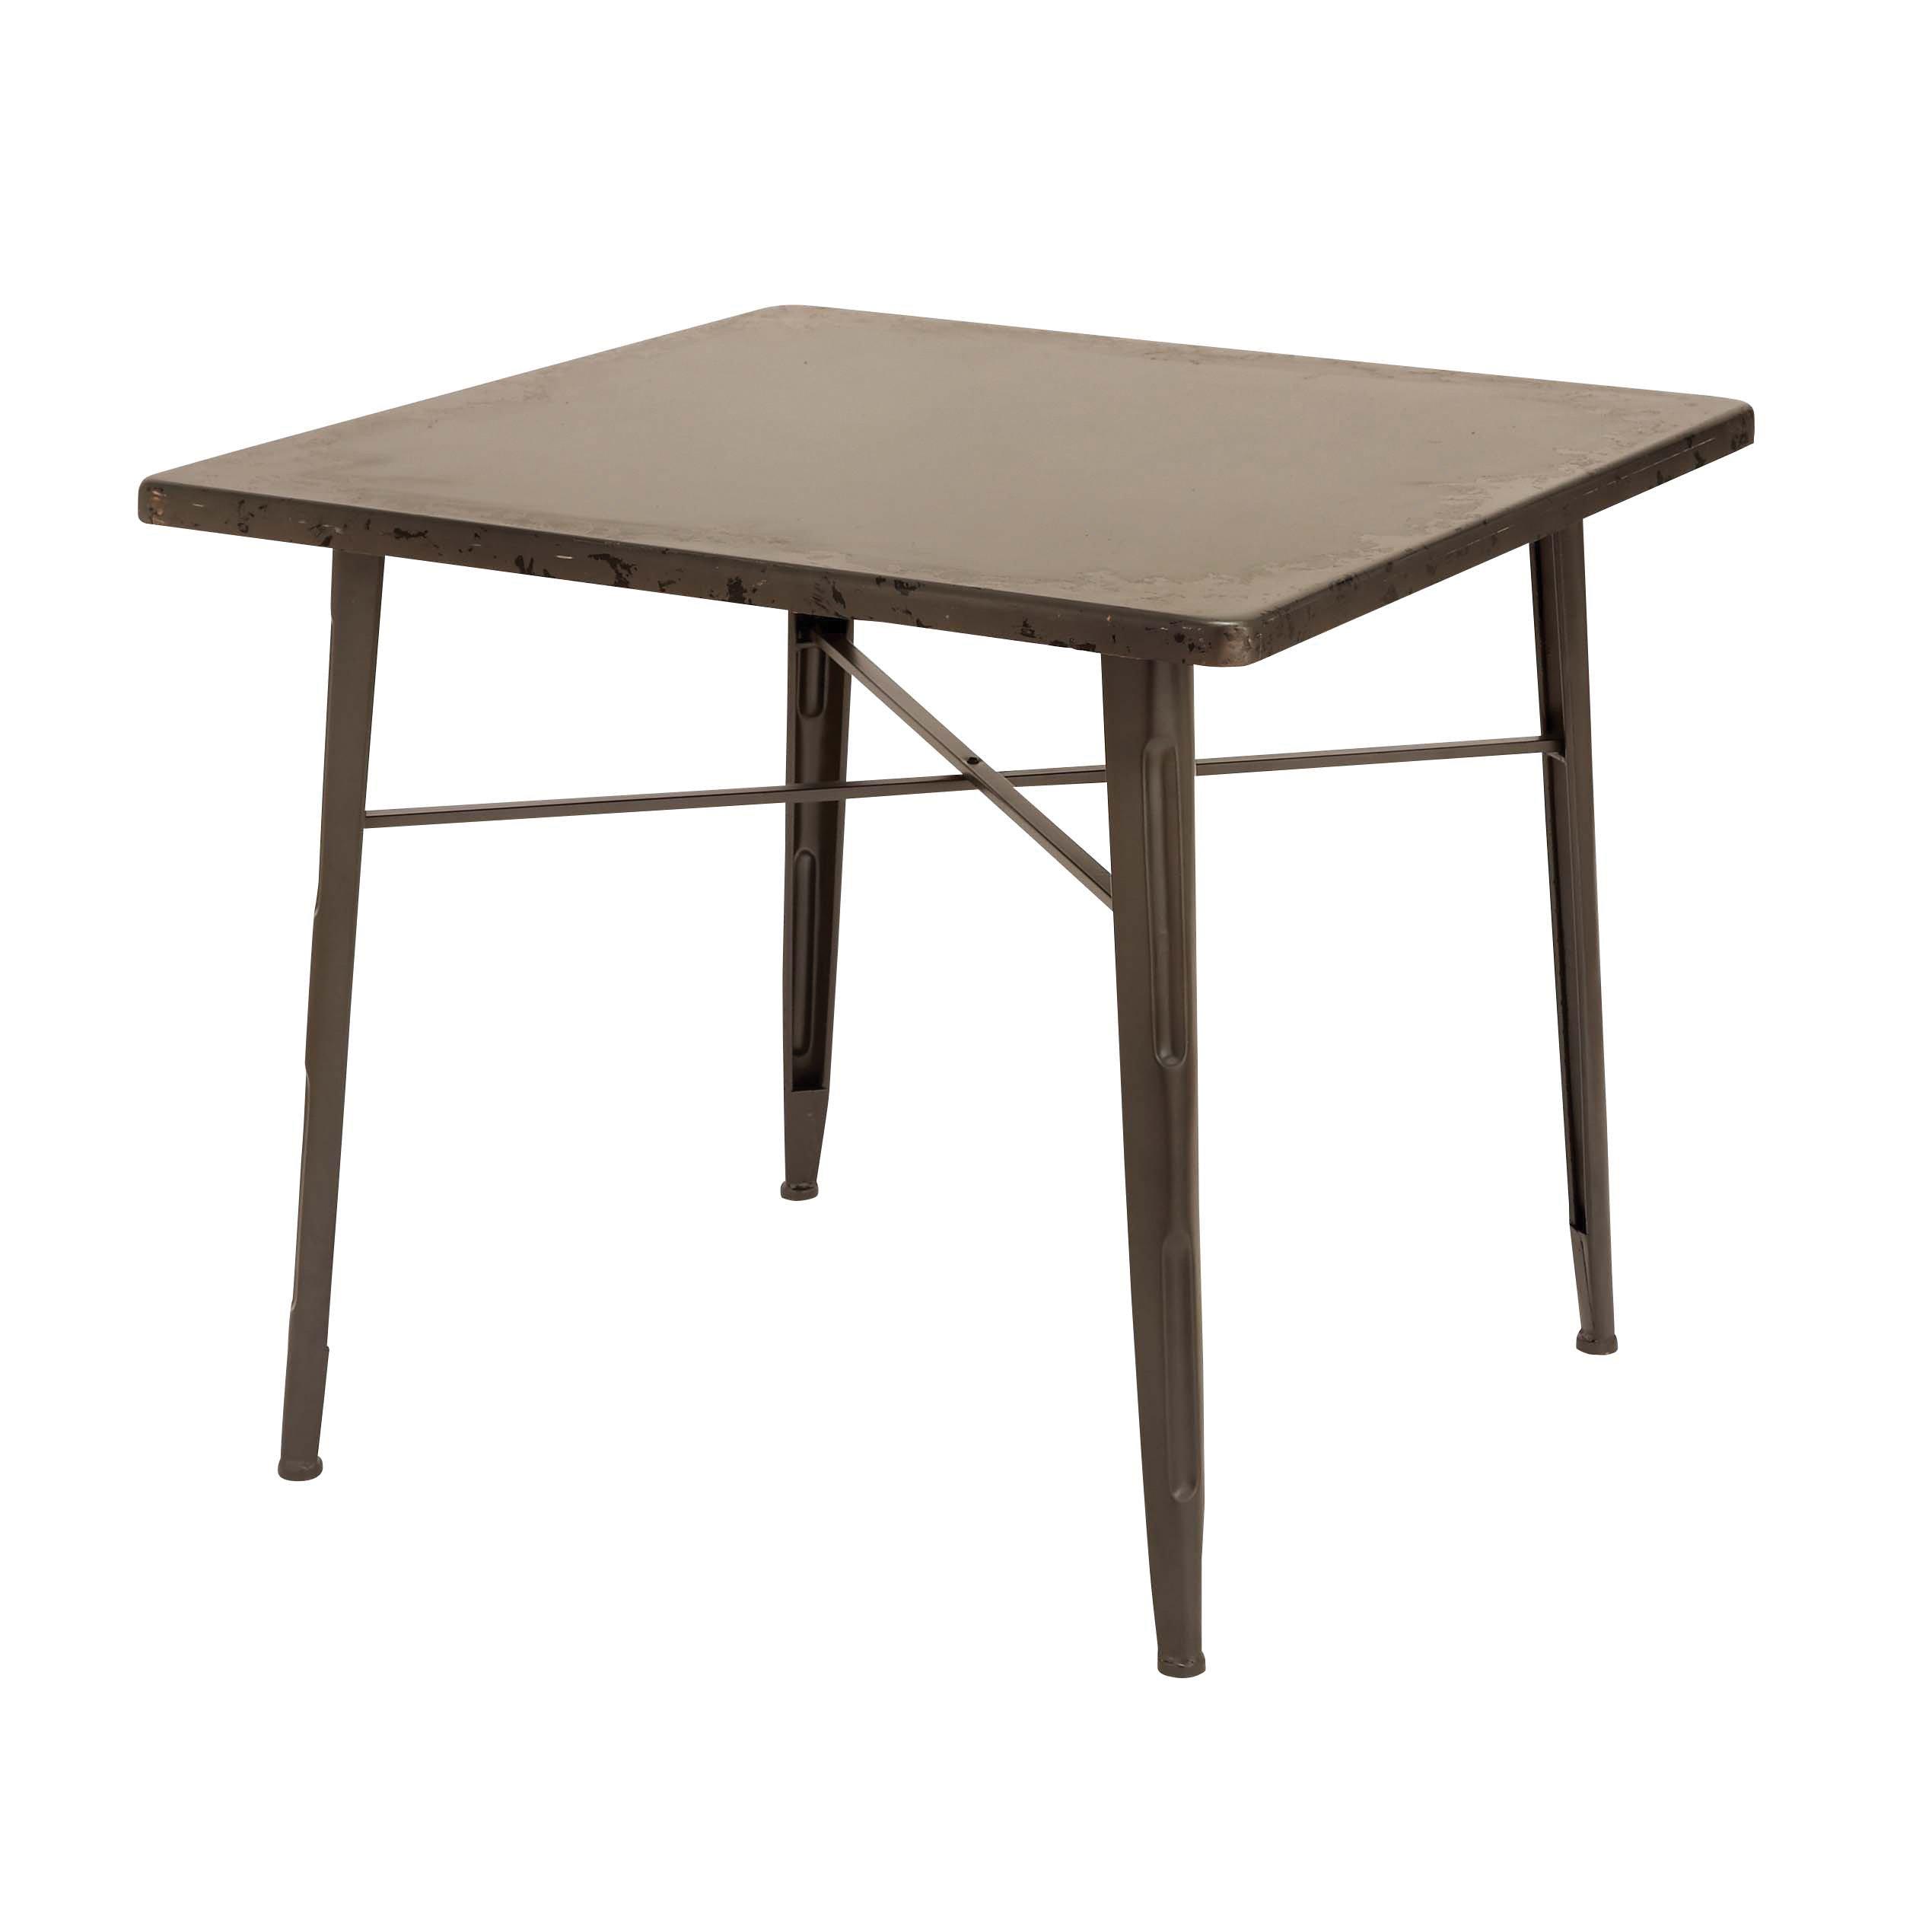 Plutus Brands Wood Table with Elegant Design, Dark Brown